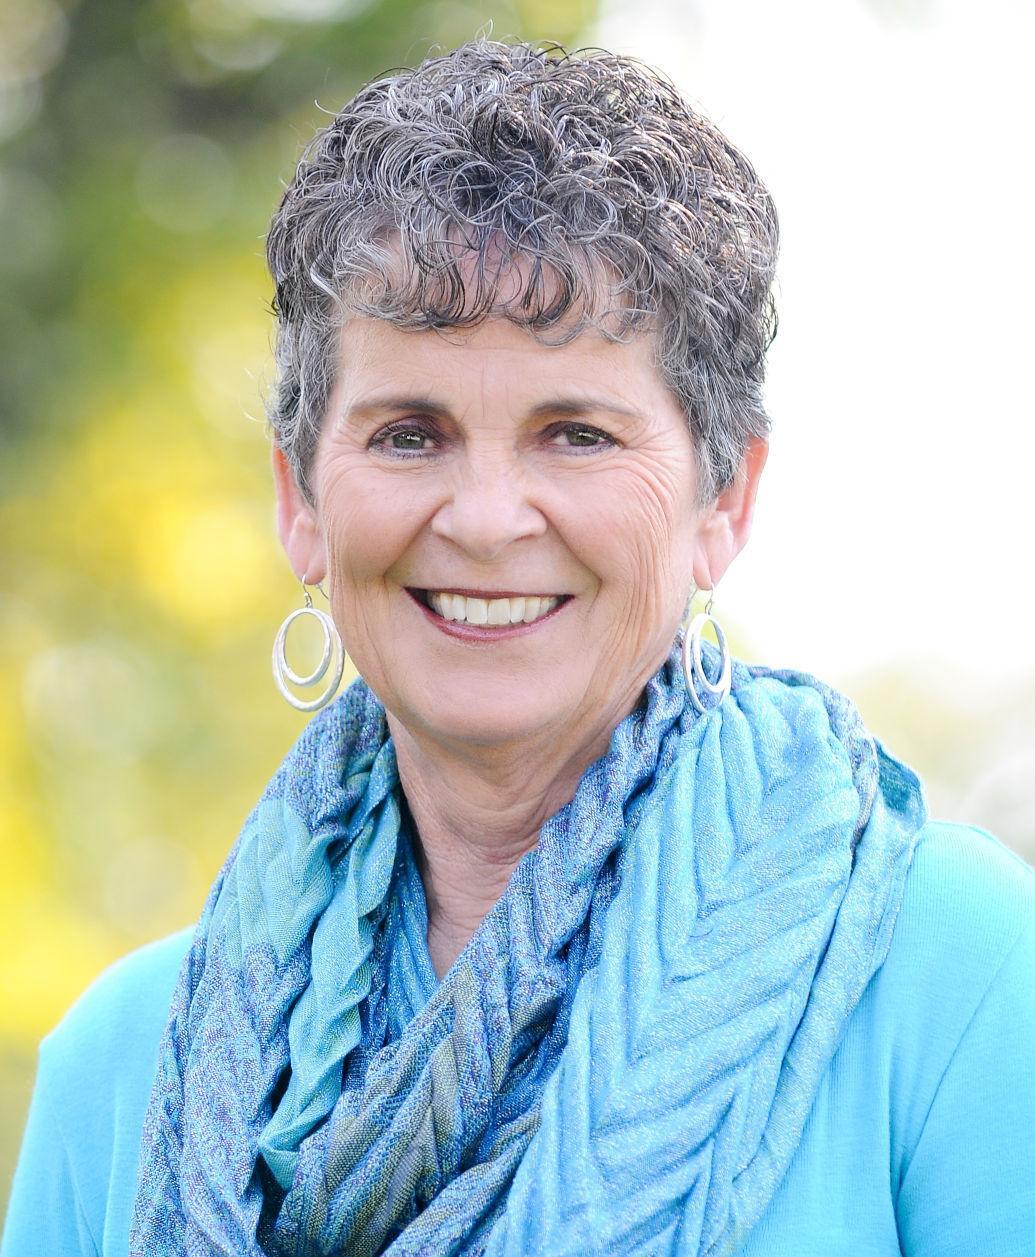 Mary Ann Stallings